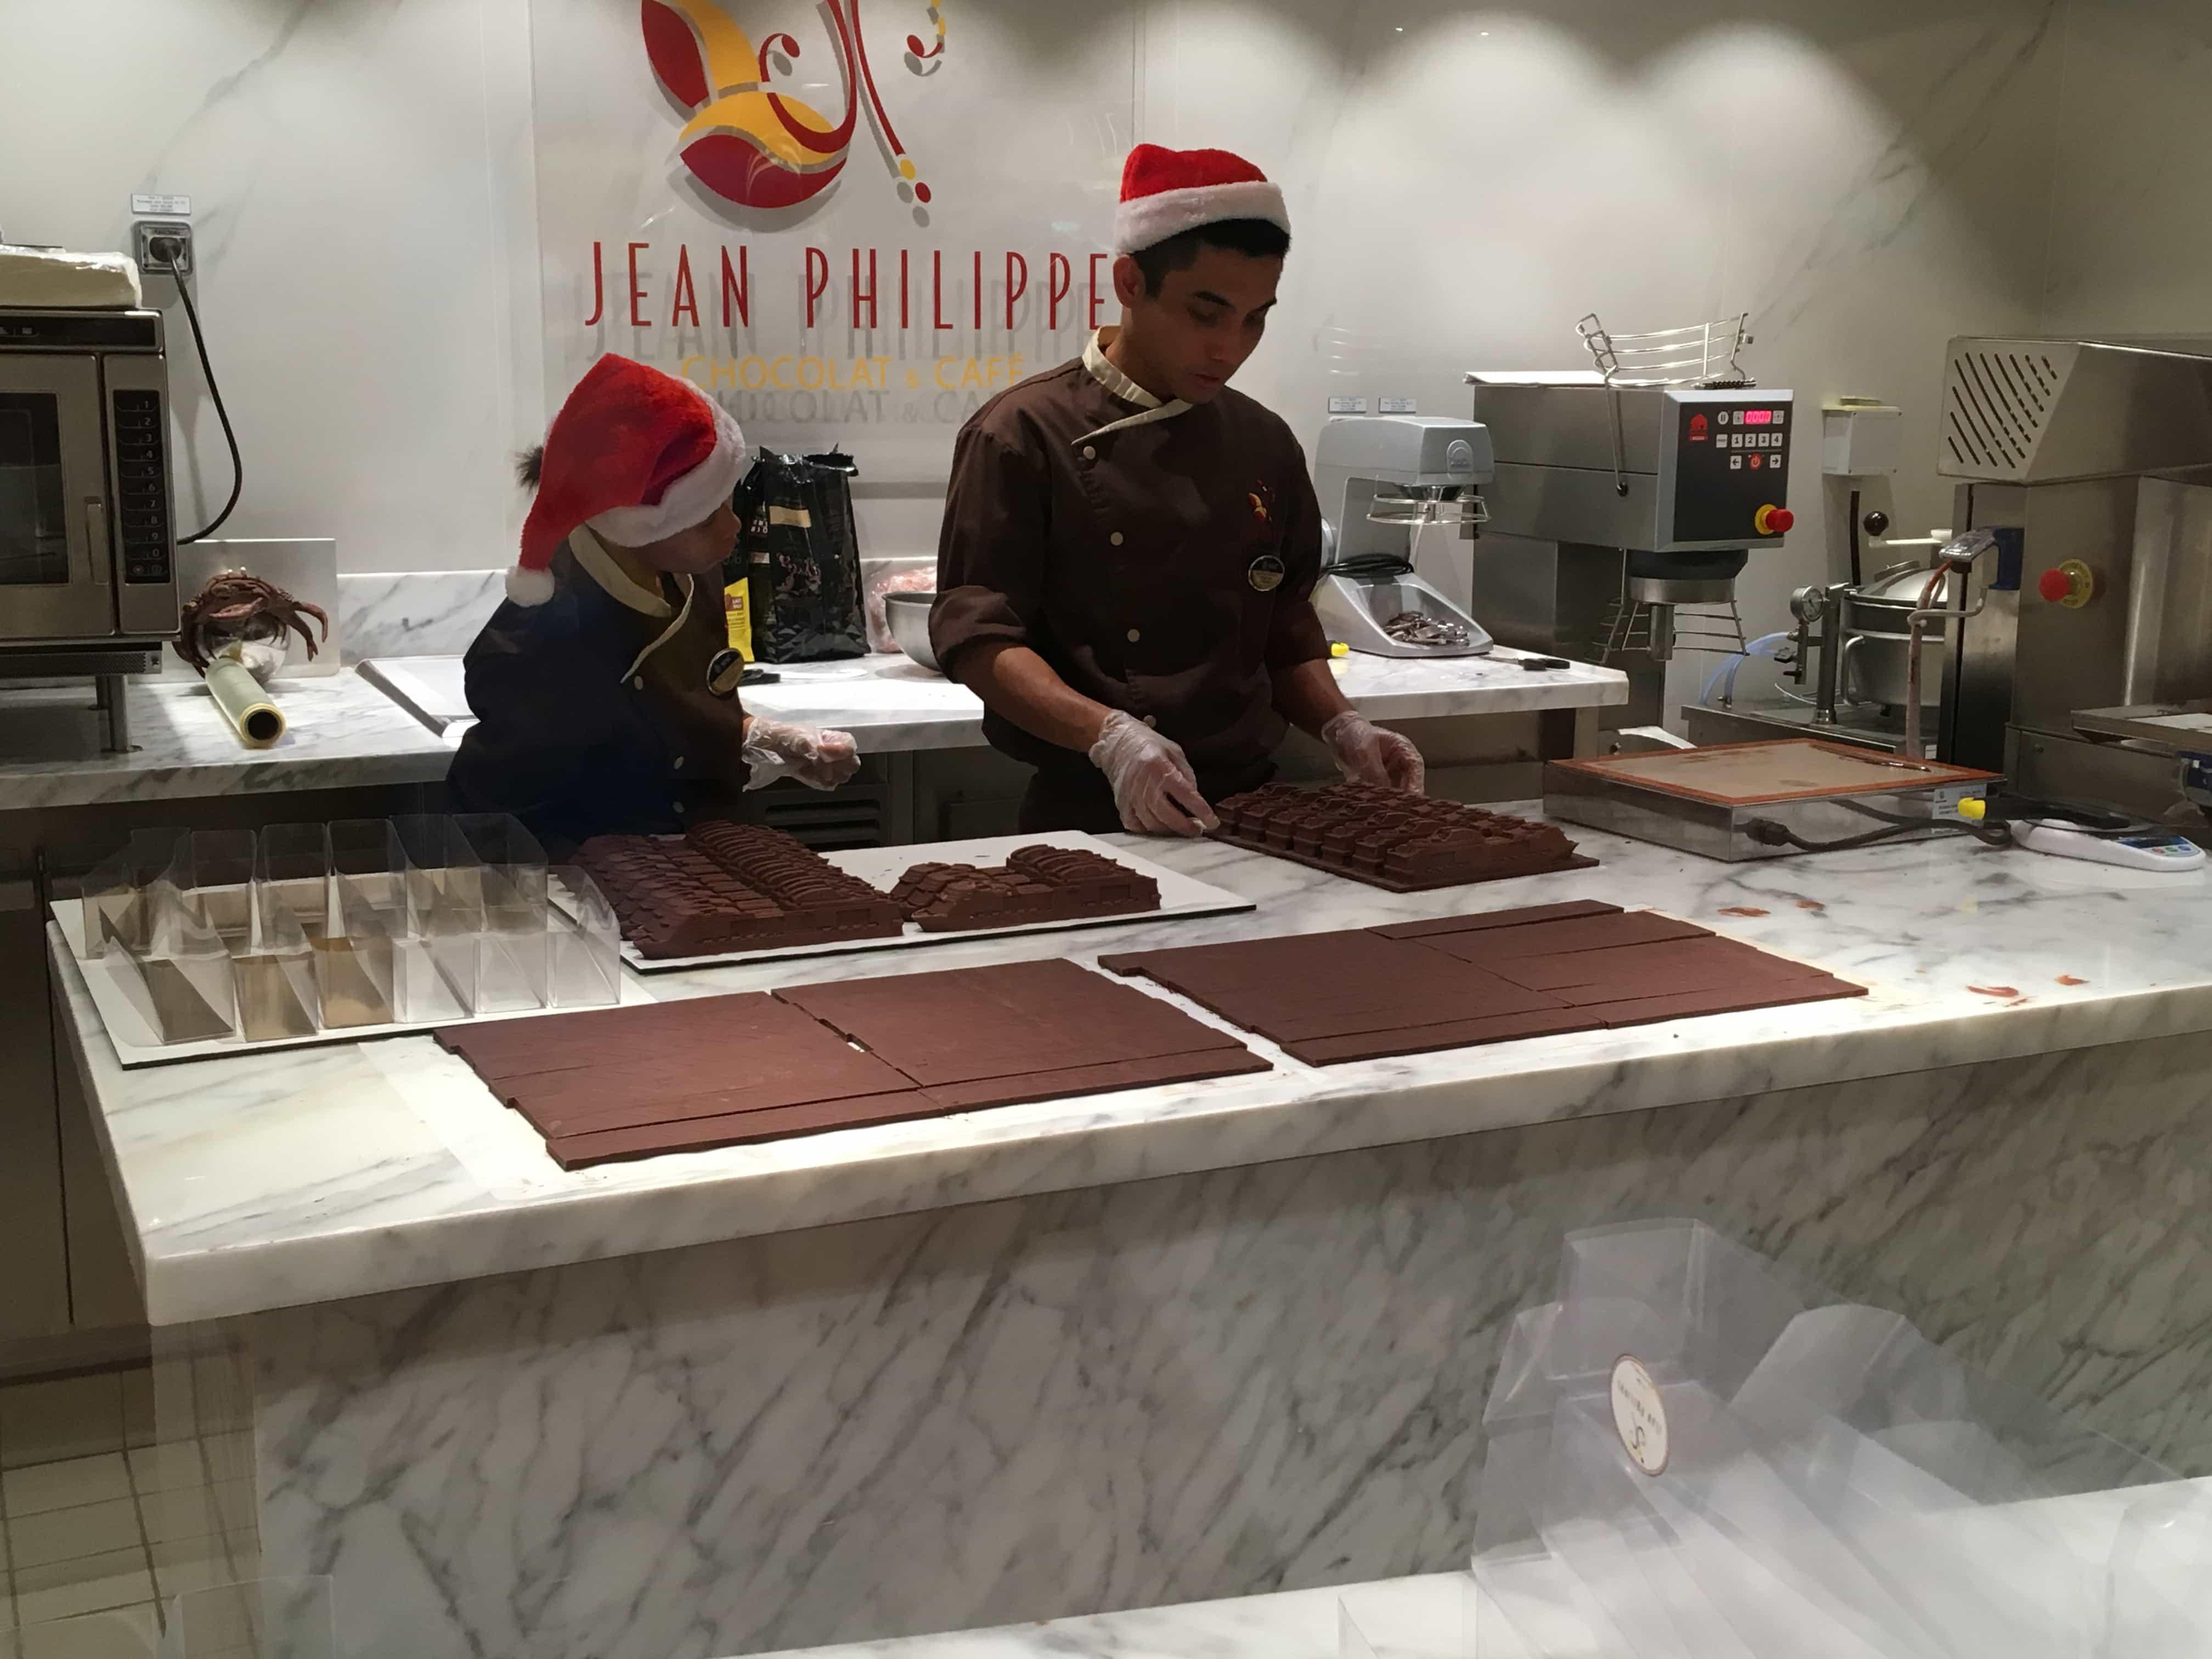 msc meraviglia chocolate shop cruise ship christmas hats jean